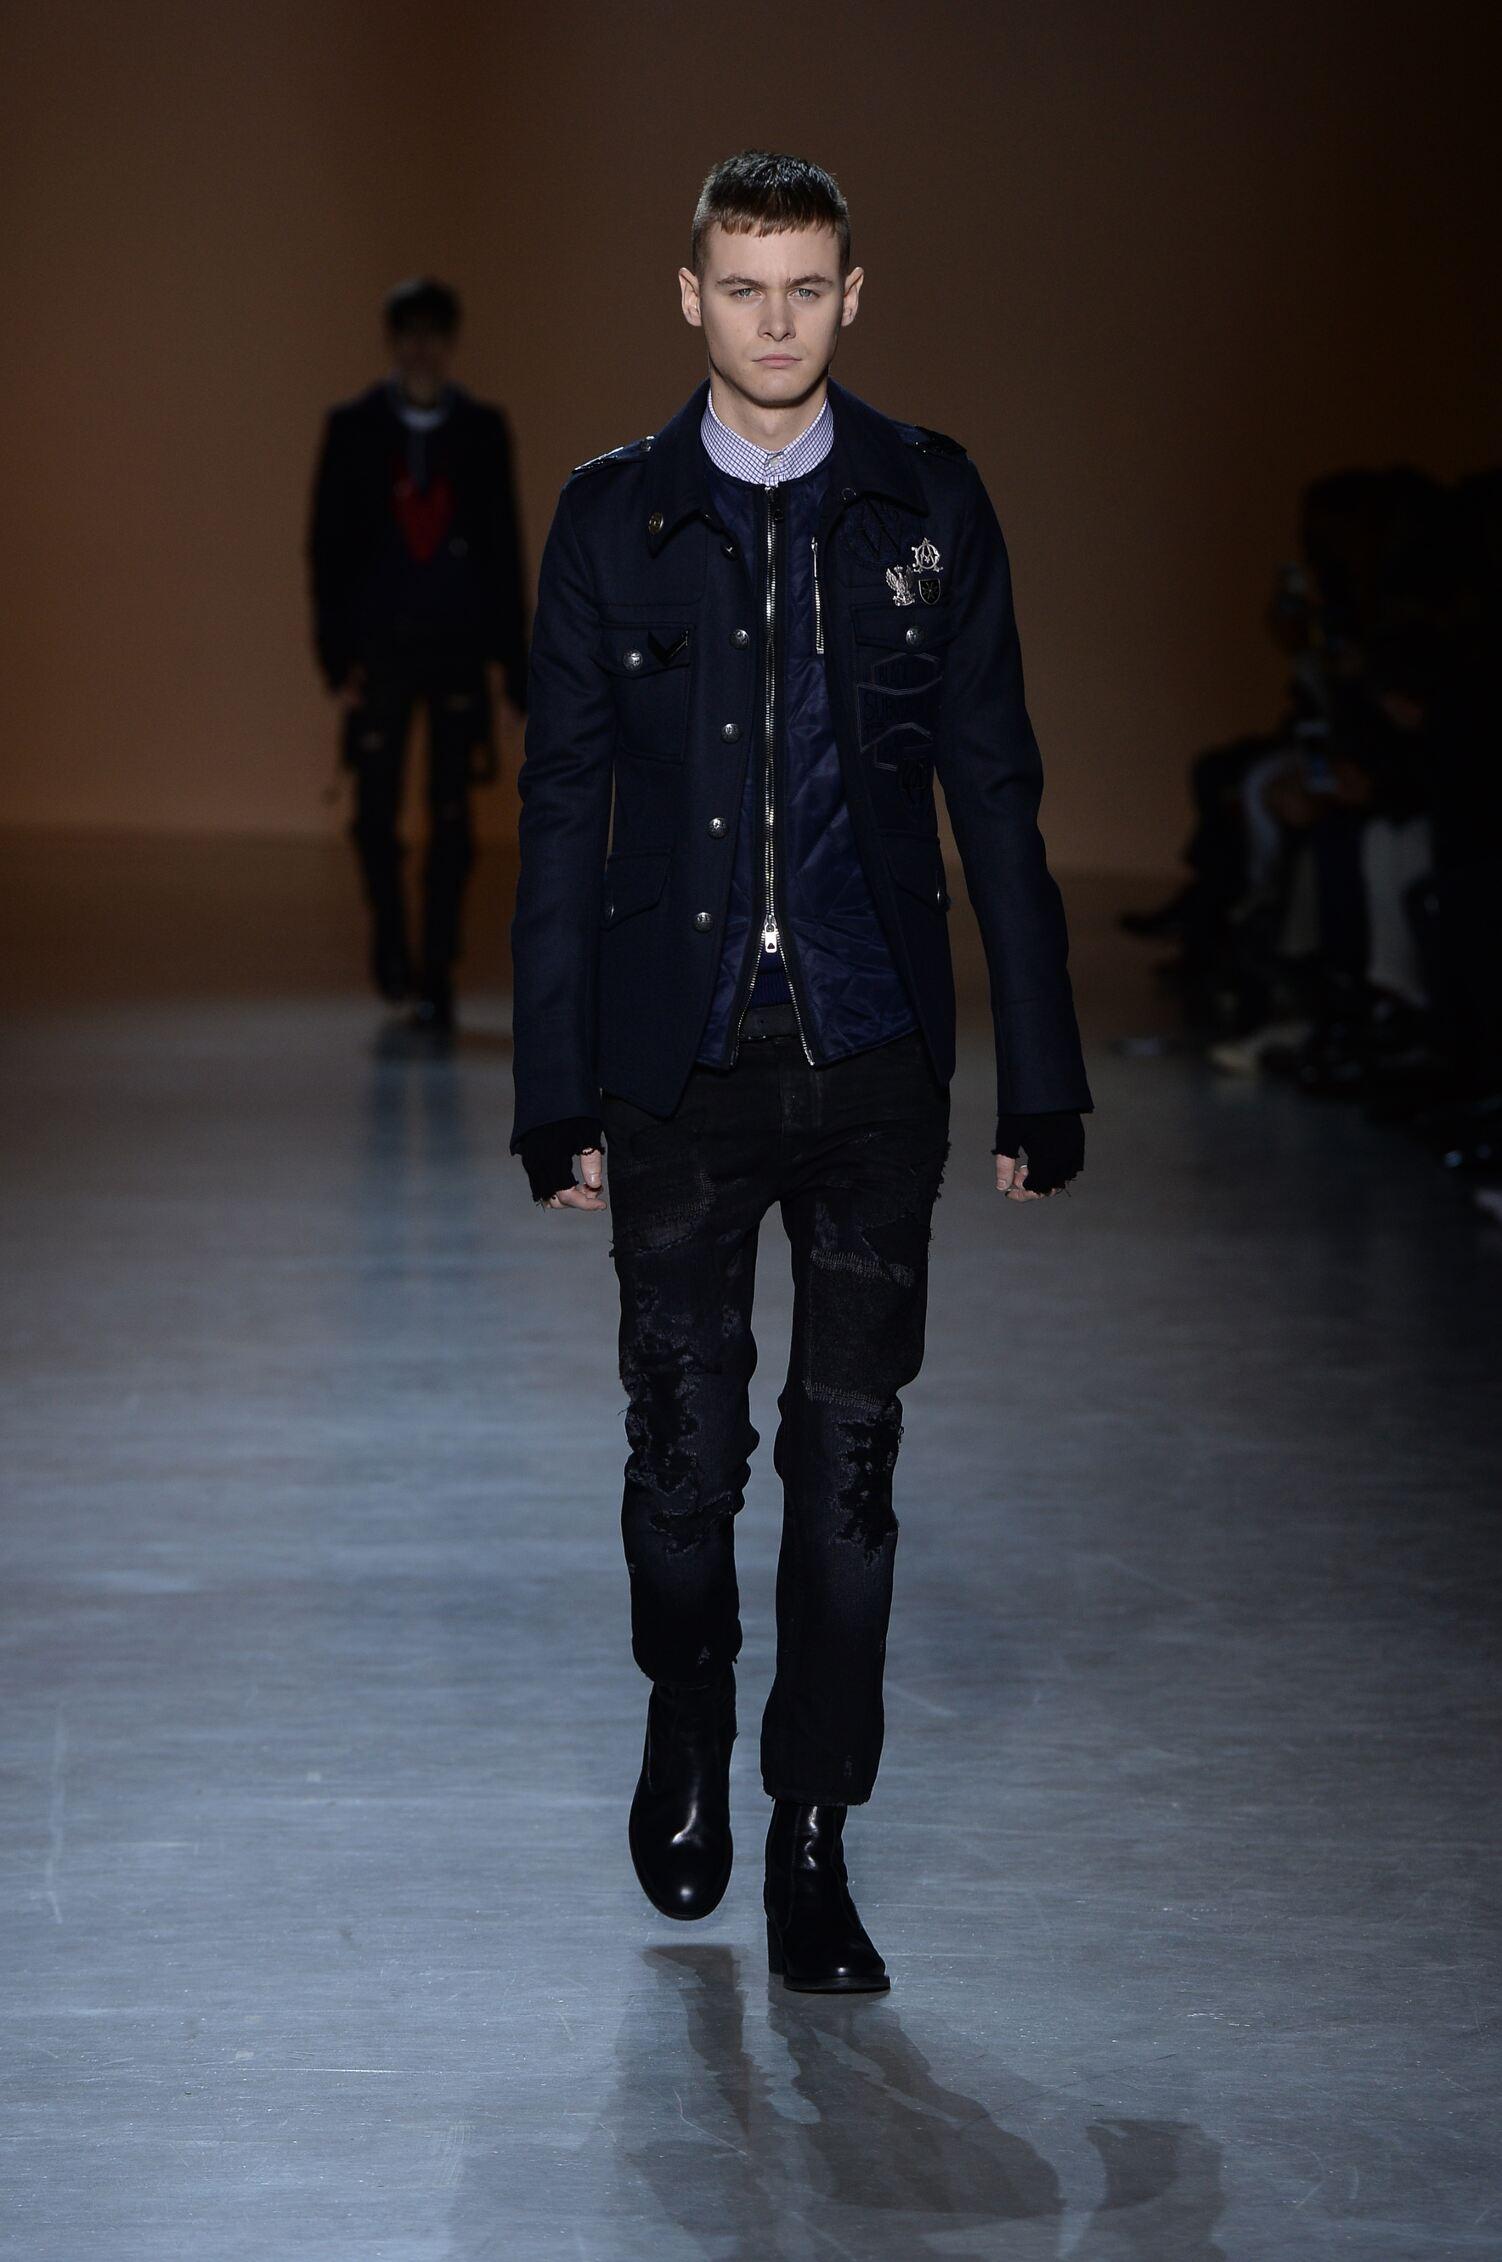 Fall Fashion Man Diesel Black Gold